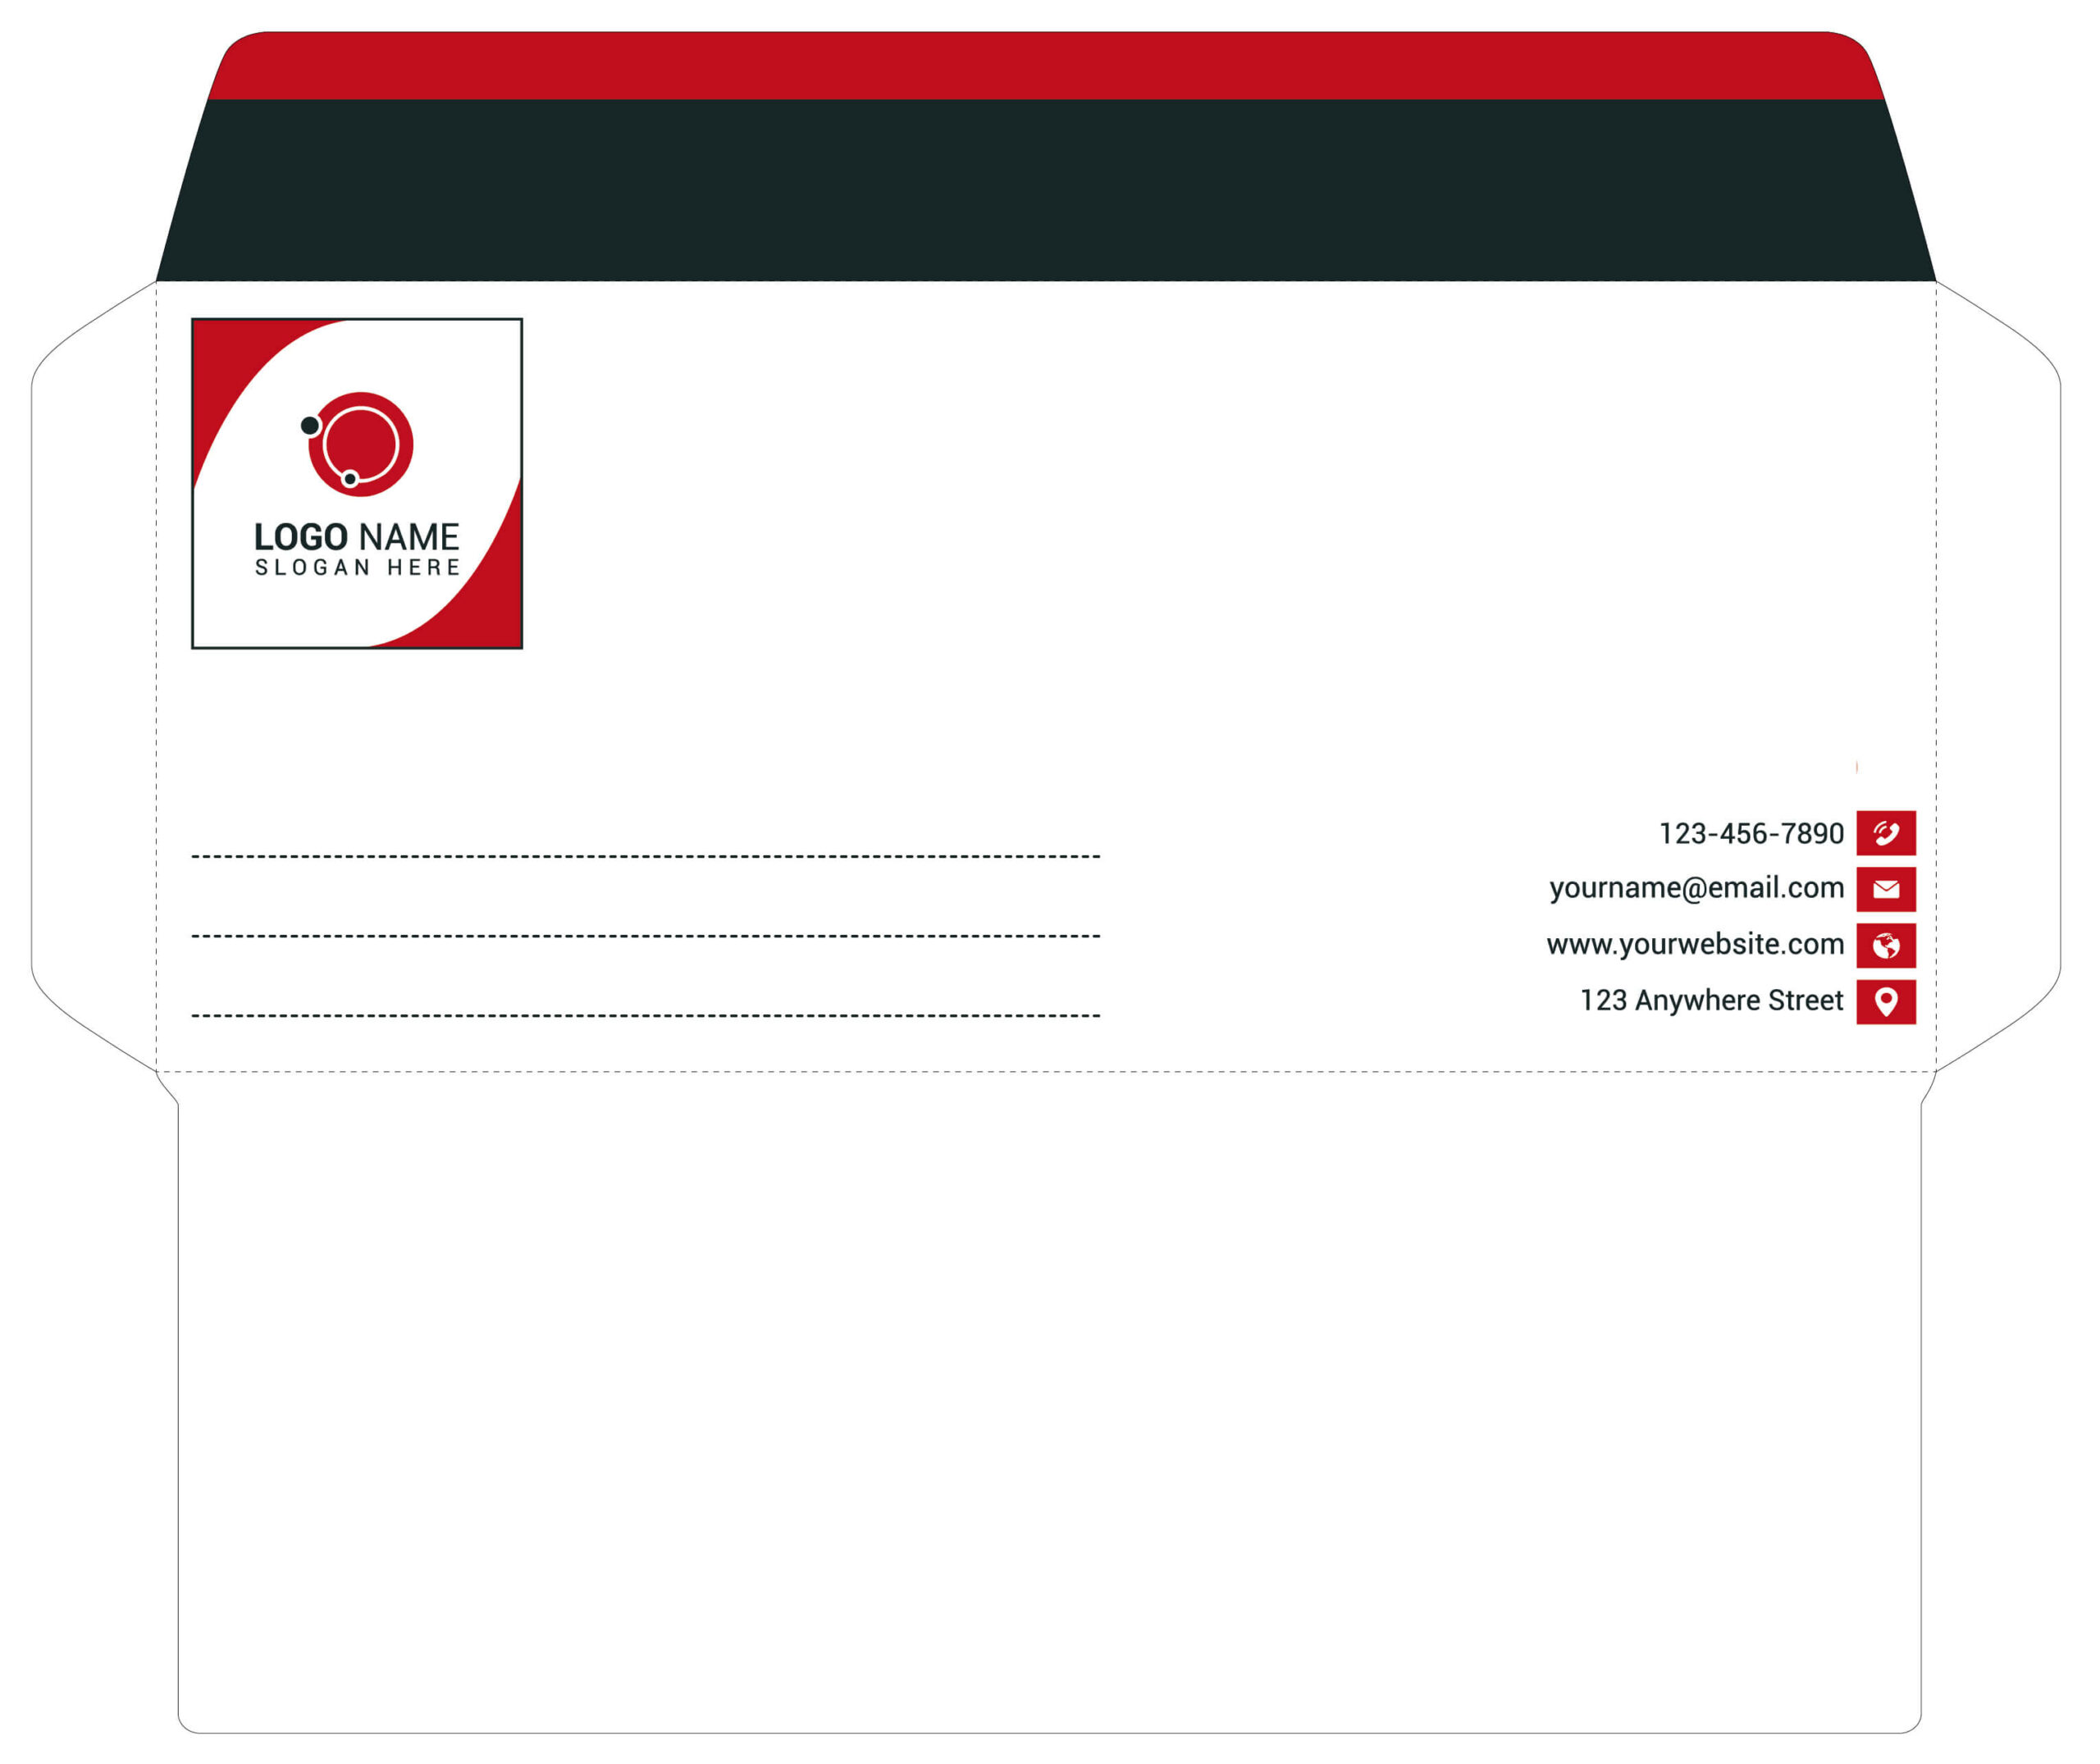 Trendy Style Red Color Envelope in Adobe Illustrator